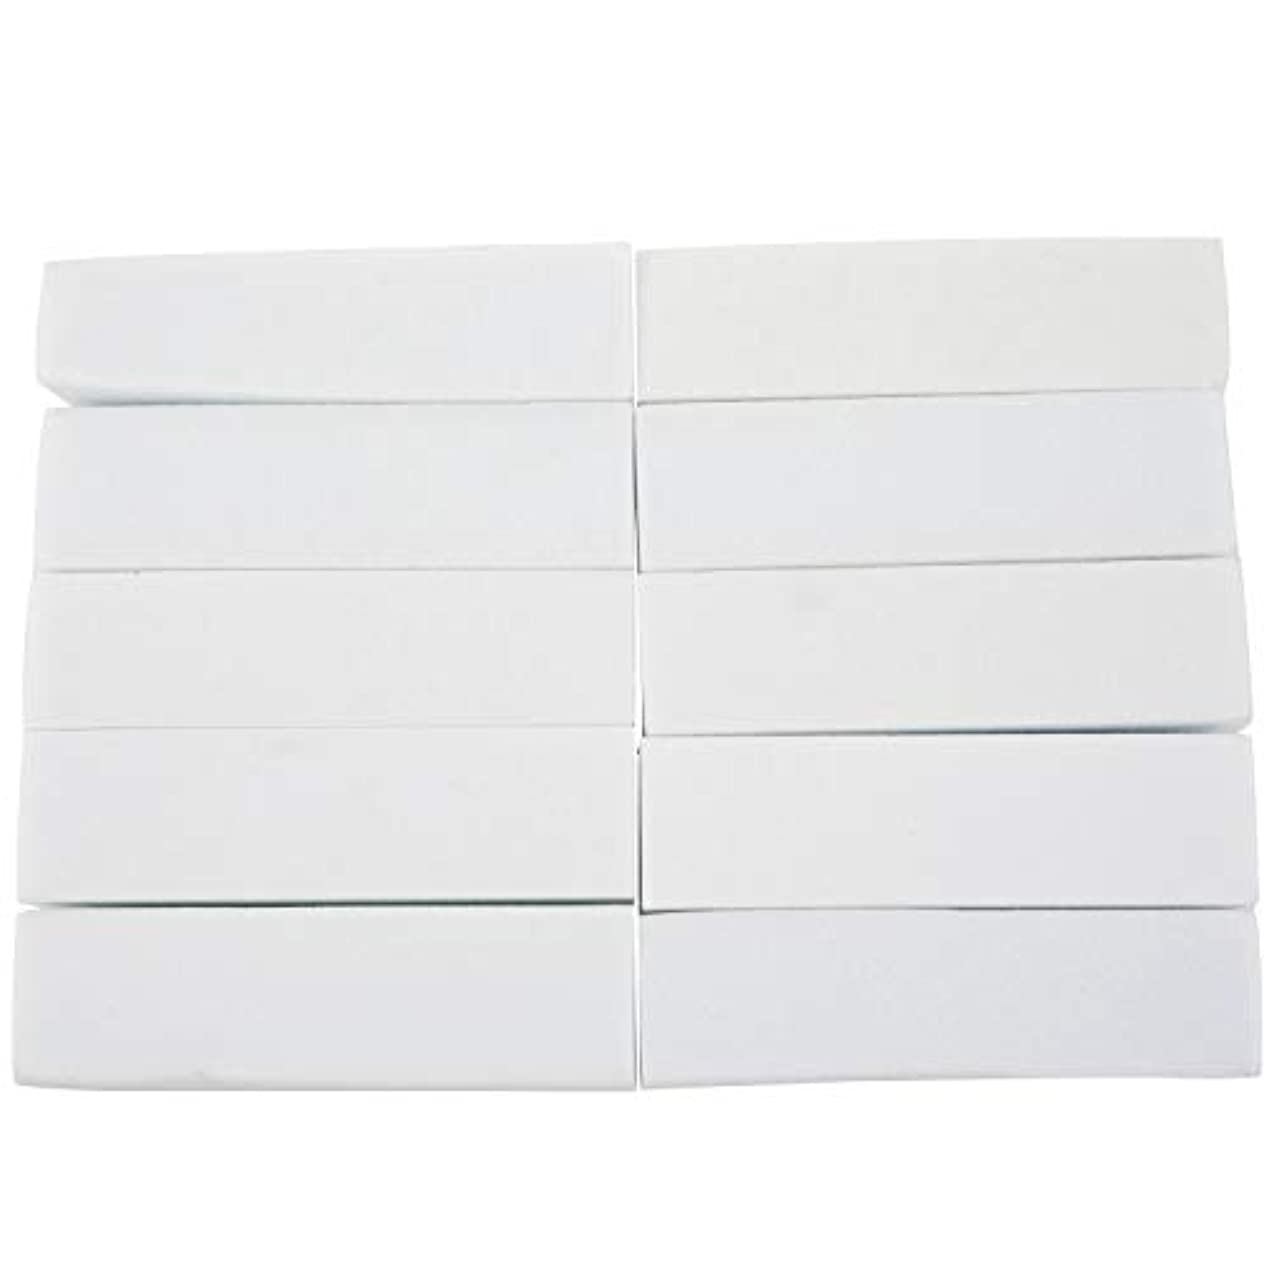 CUHAWUDBA 10x白いのアクリルネイルアートのバフ研磨のツール、マニキュアツール